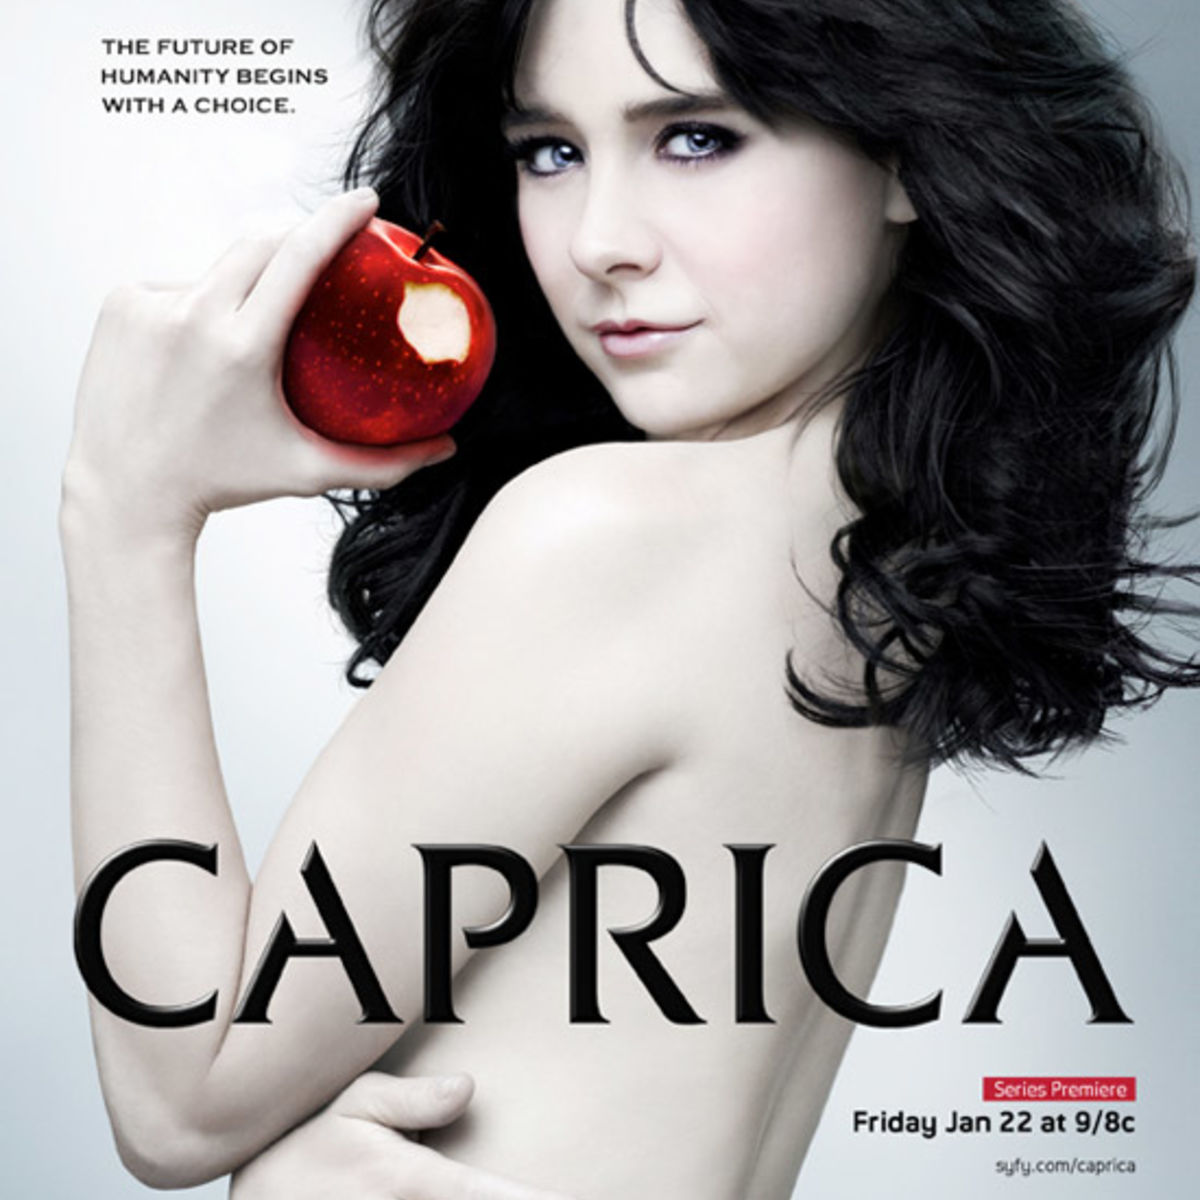 CapricaKeyArt.jpg